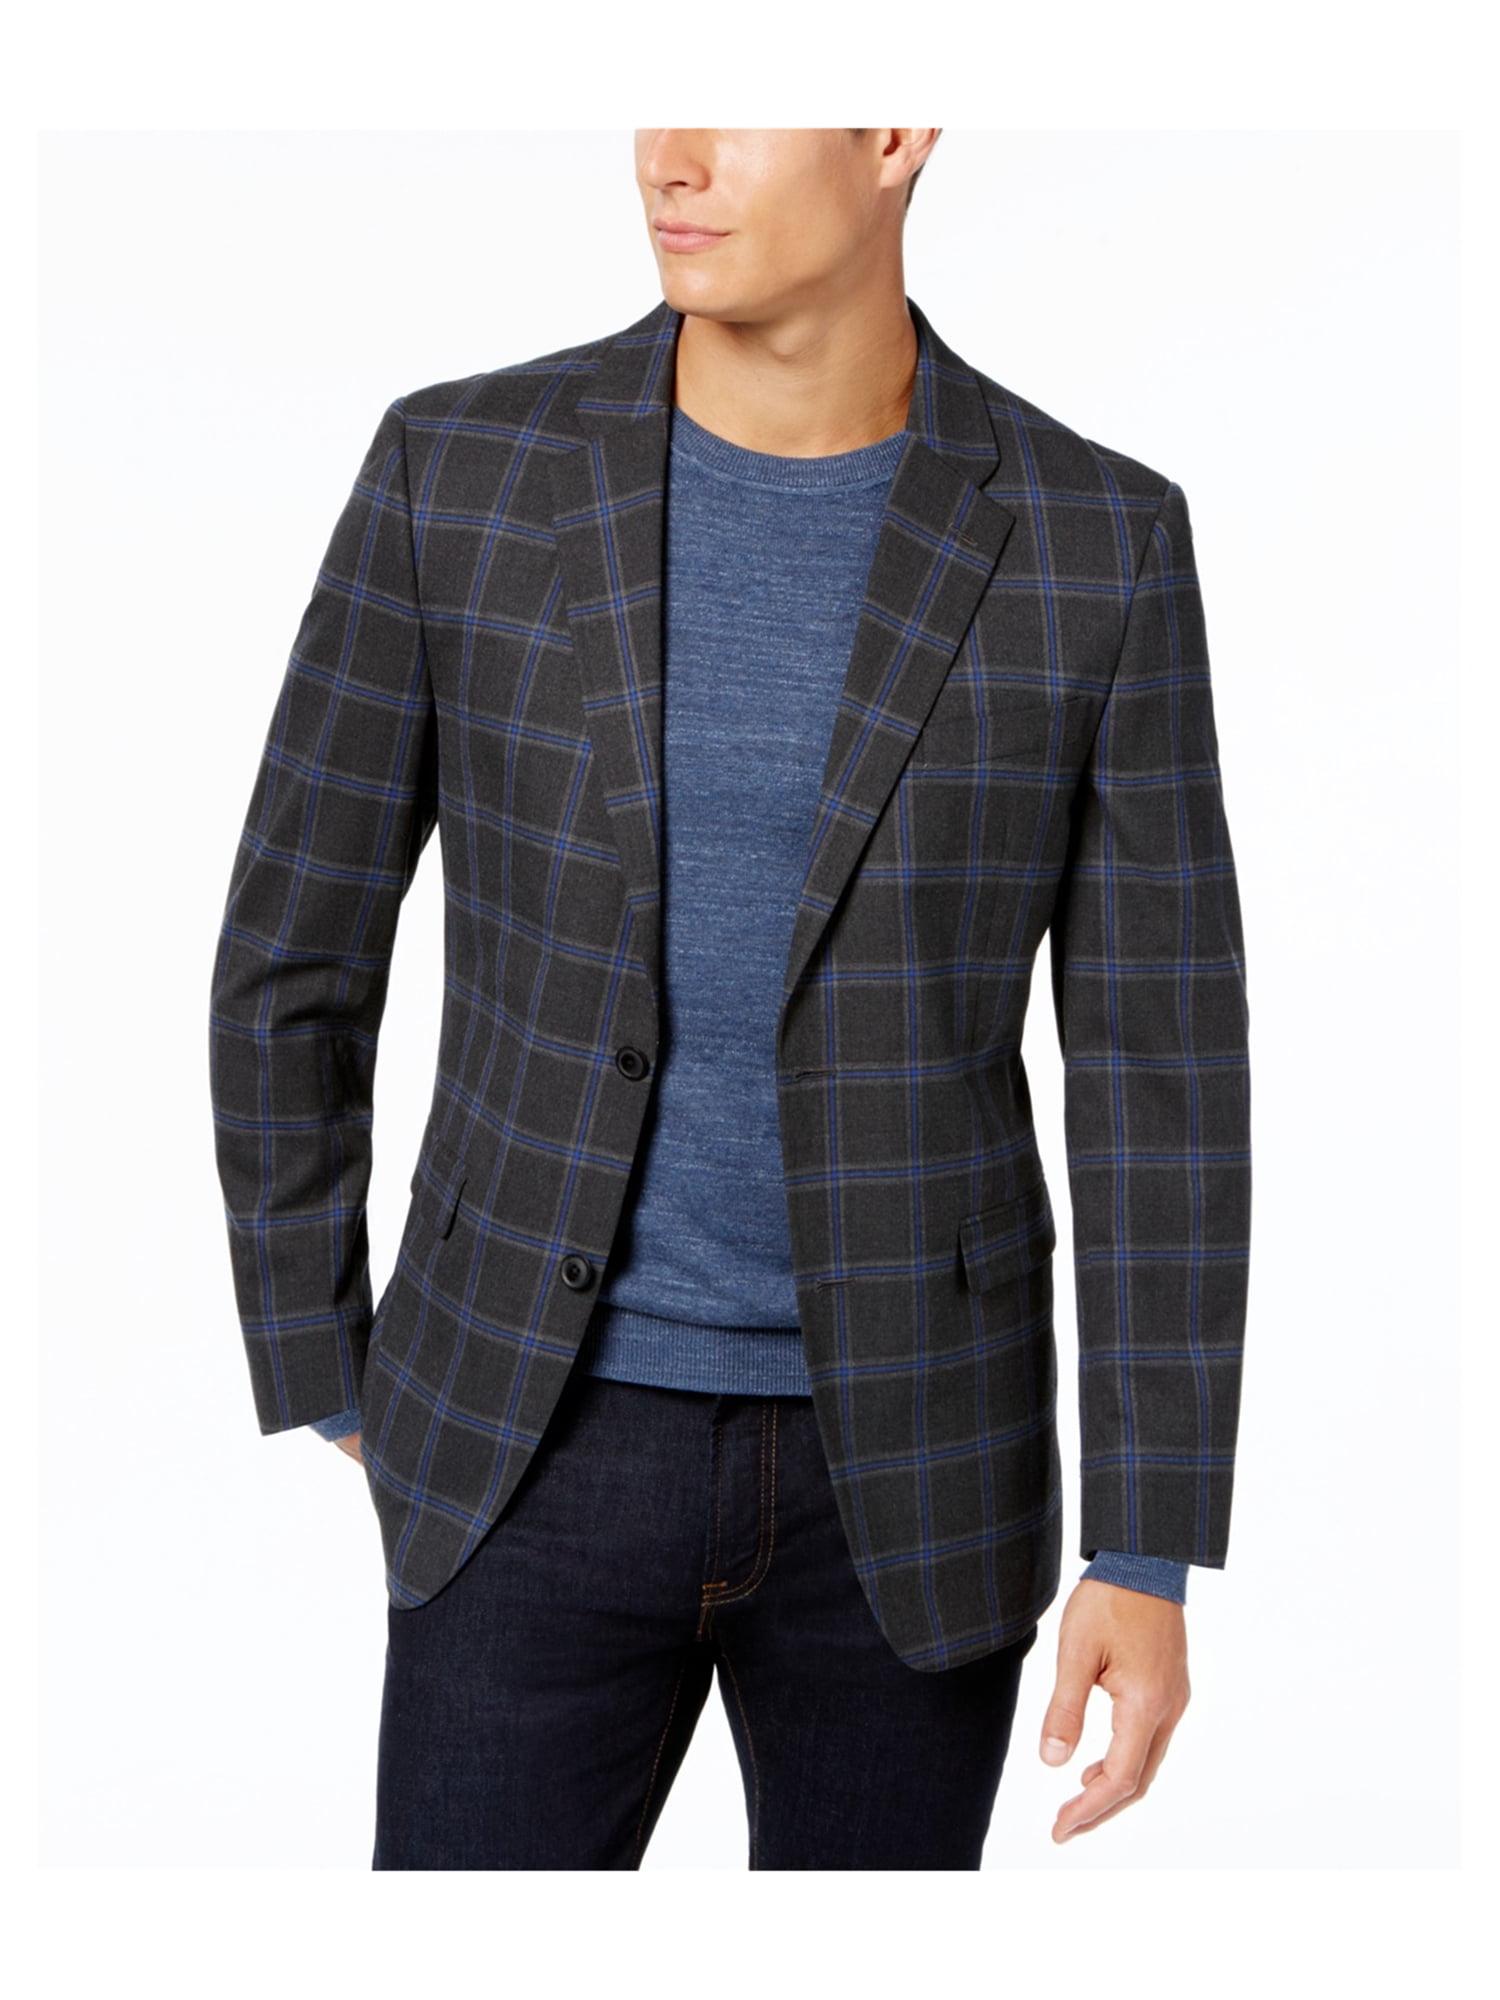 e17eb552b Tommy Hilfiger Mens Slim-Fit Two Button Blazer Jacket darkgray 40 ...